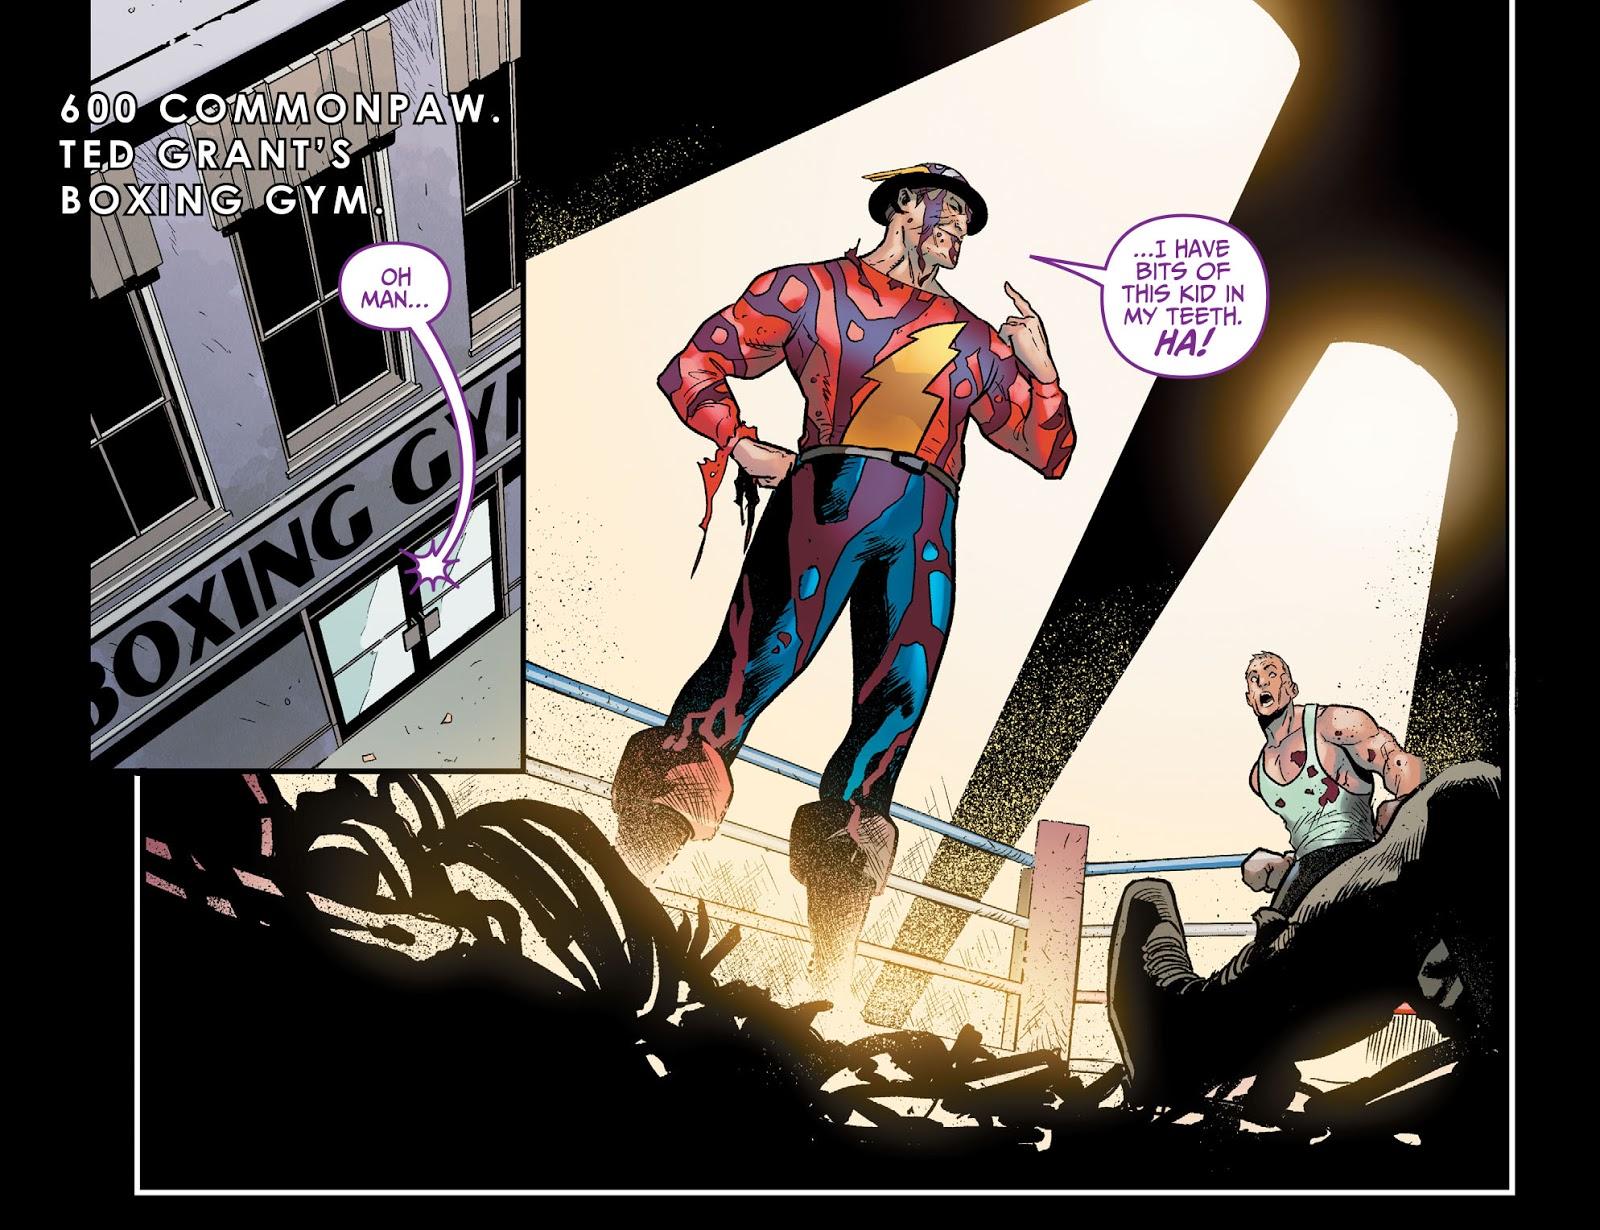 Joker-Jay Garrick VS Wildcat (Injustice Gods Among Us)